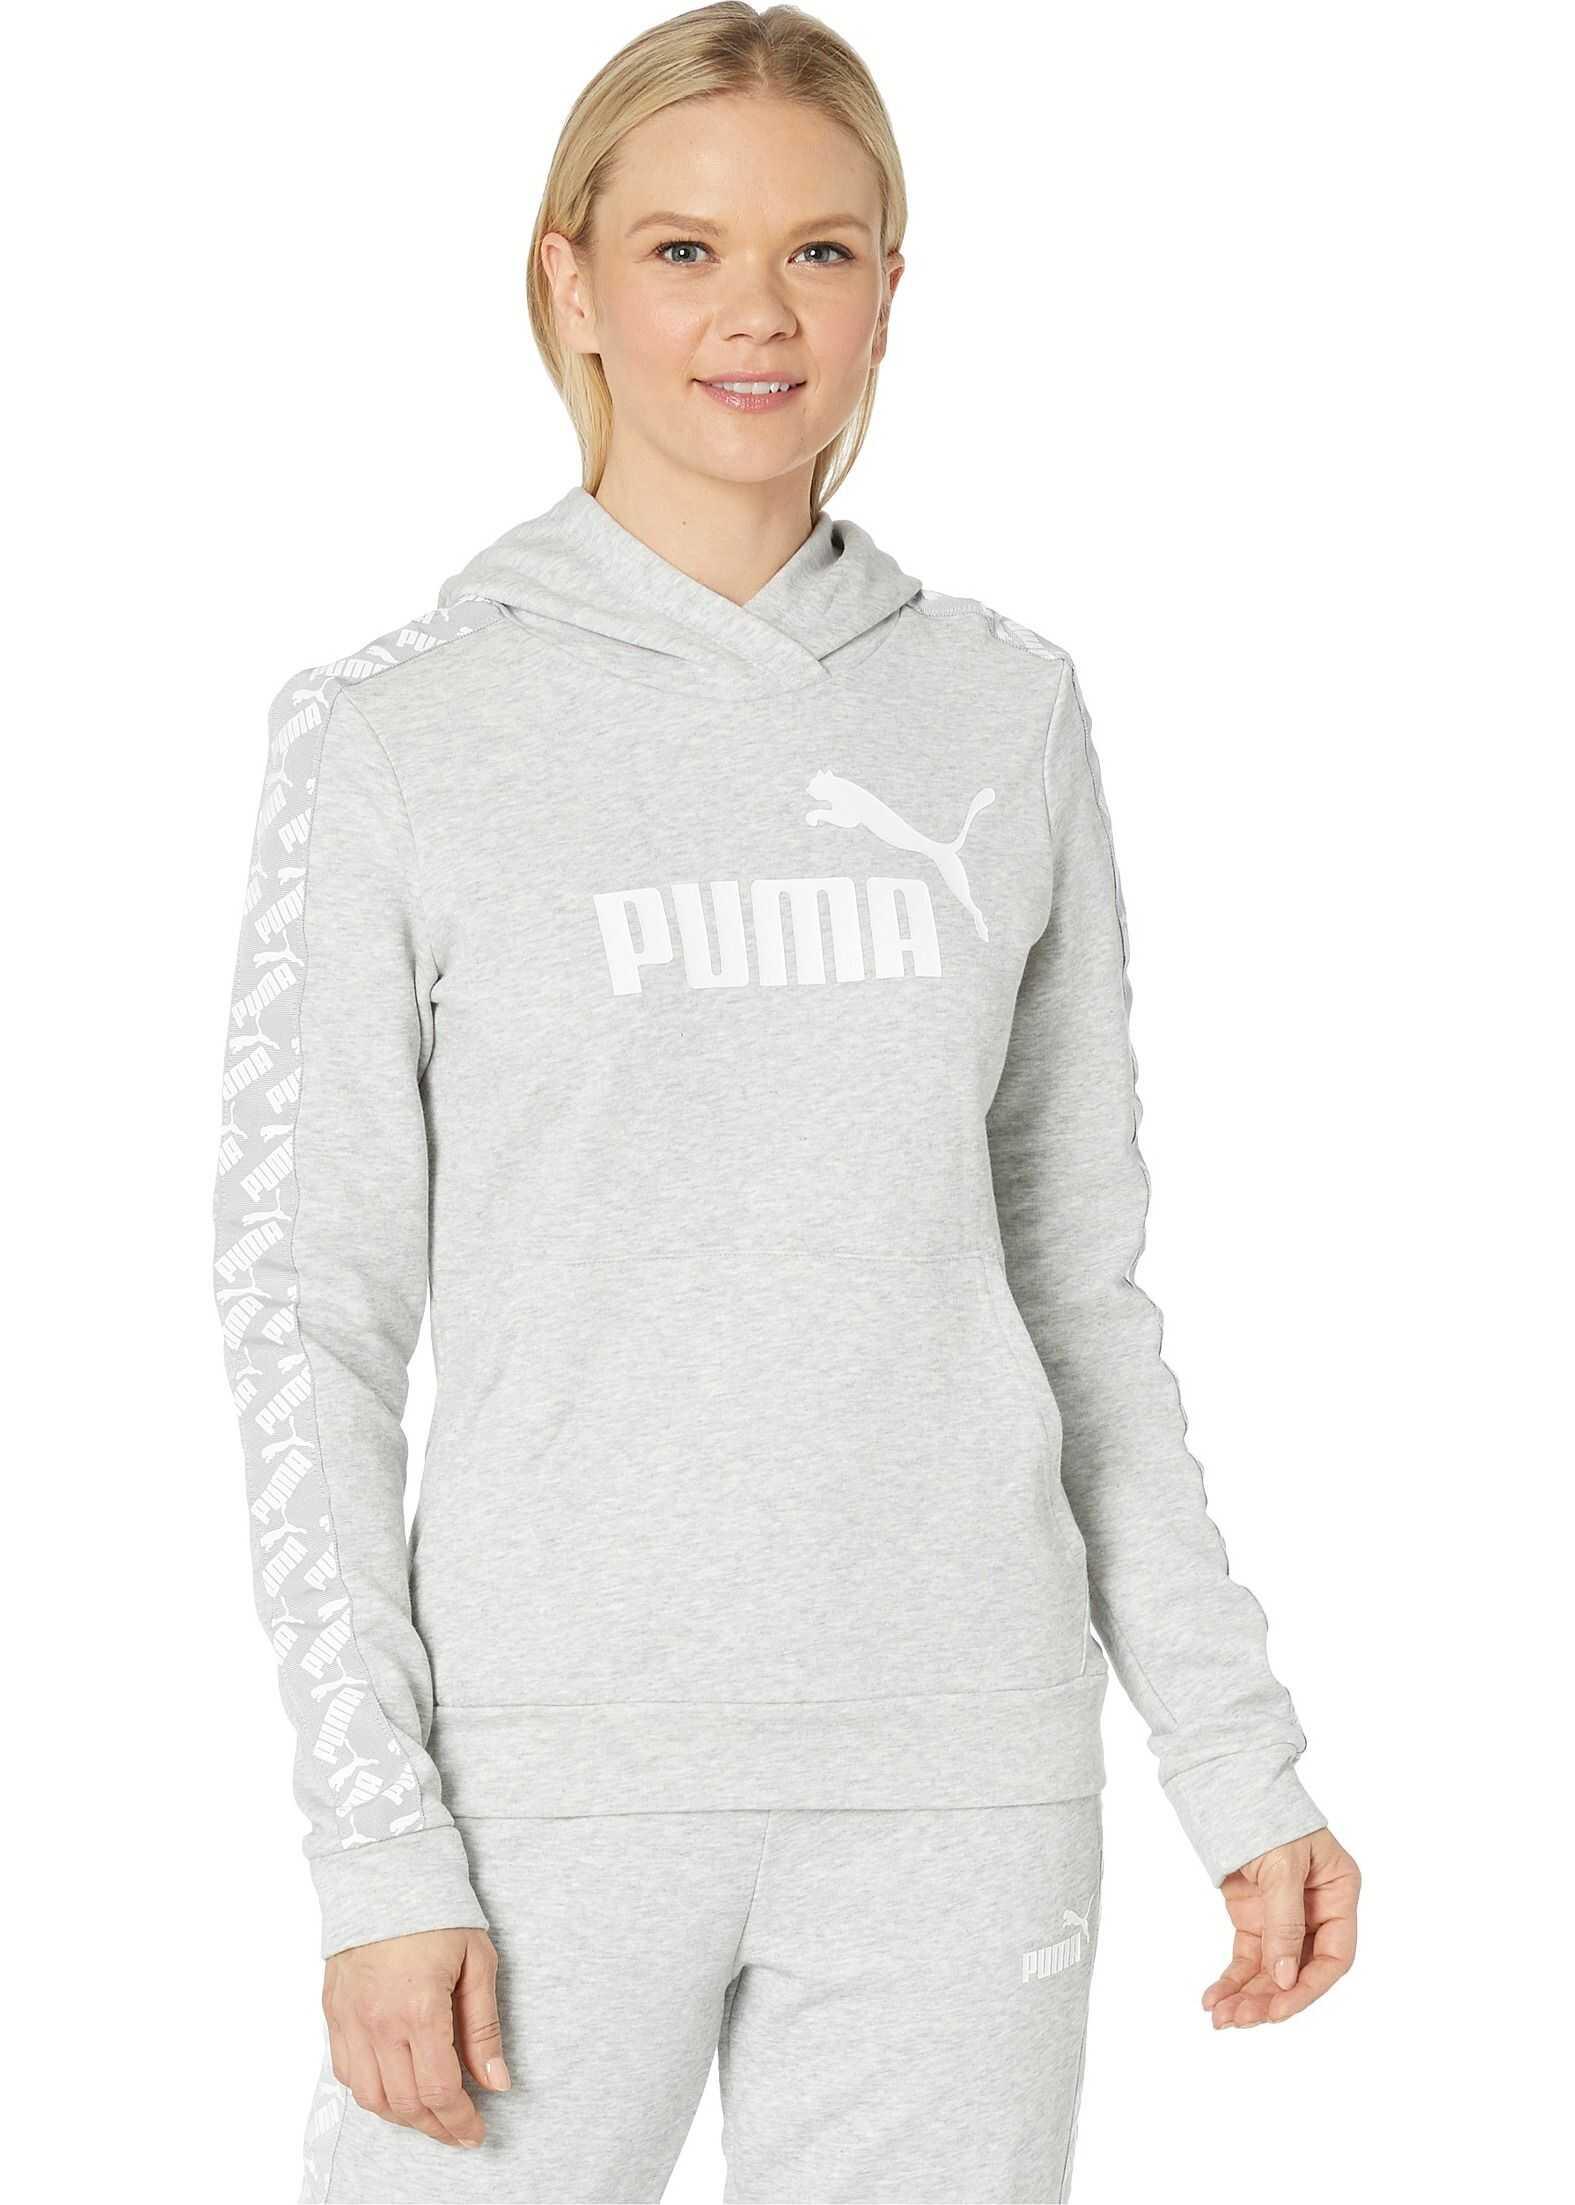 PUMA Amplified Hoodie Light Grey Heather